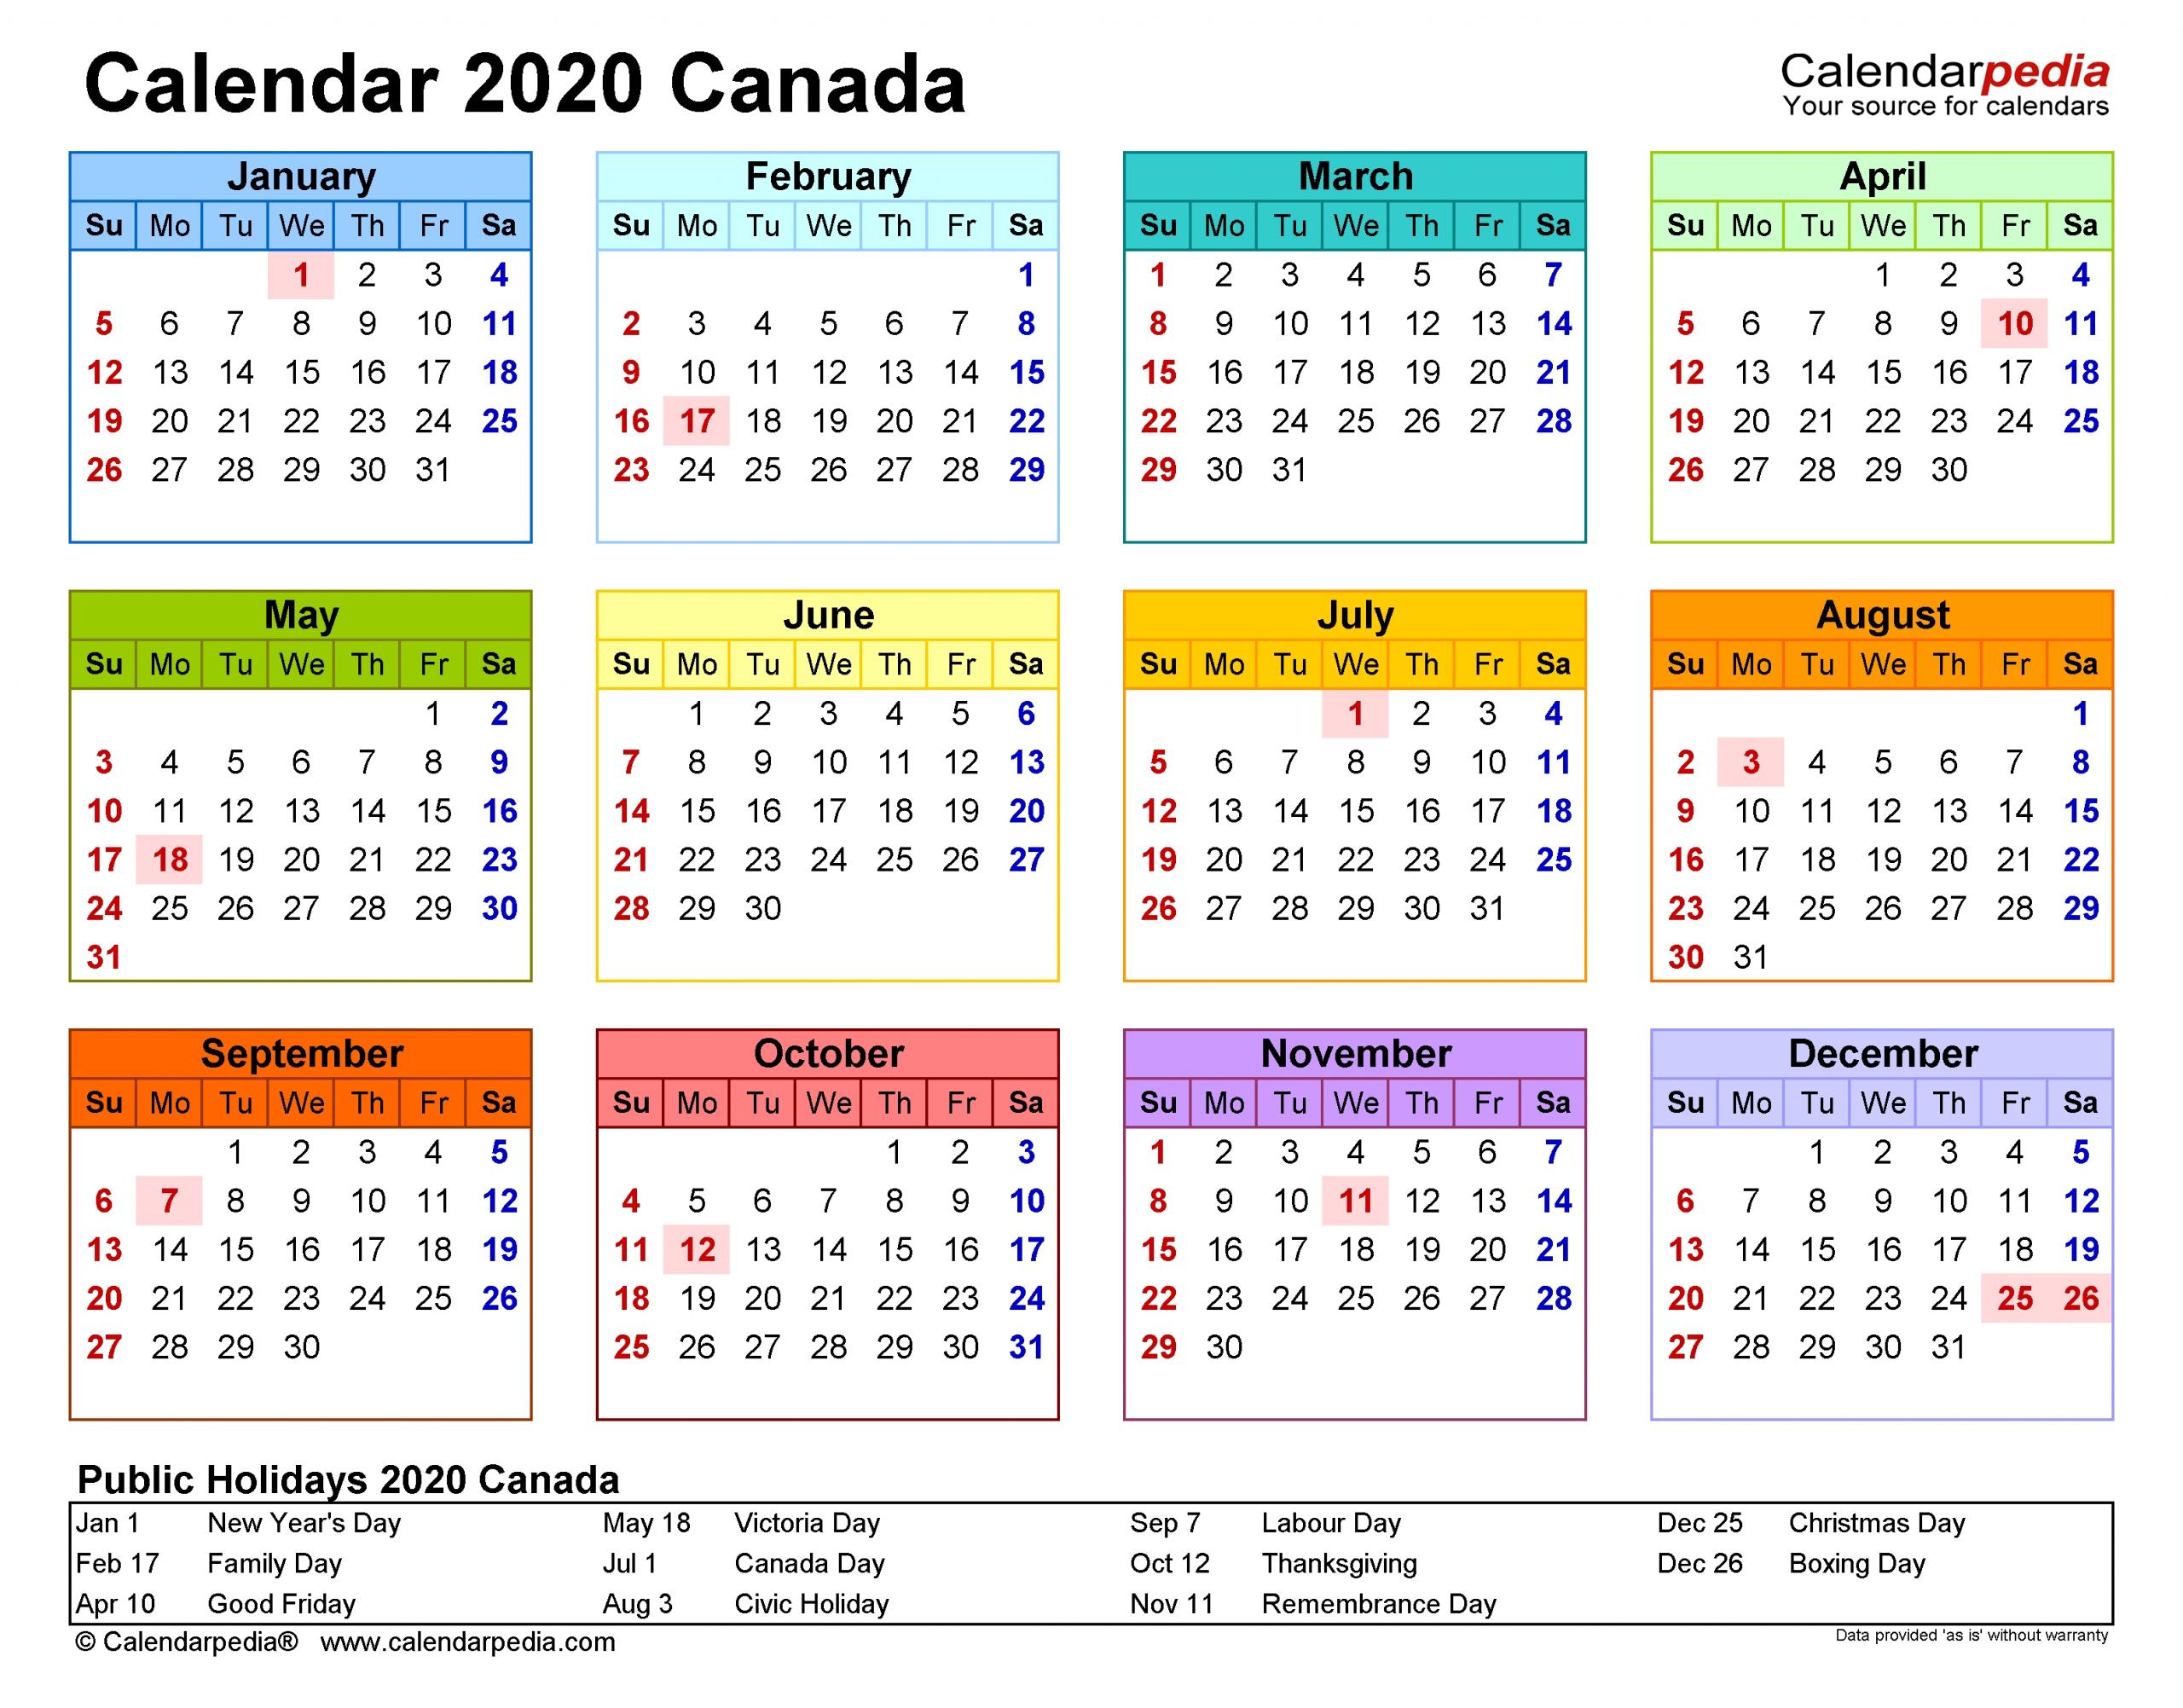 Canada Calendar 2020 - Free Printable Excel Templates regarding 2020 Calendar Landscape Year At A Glance